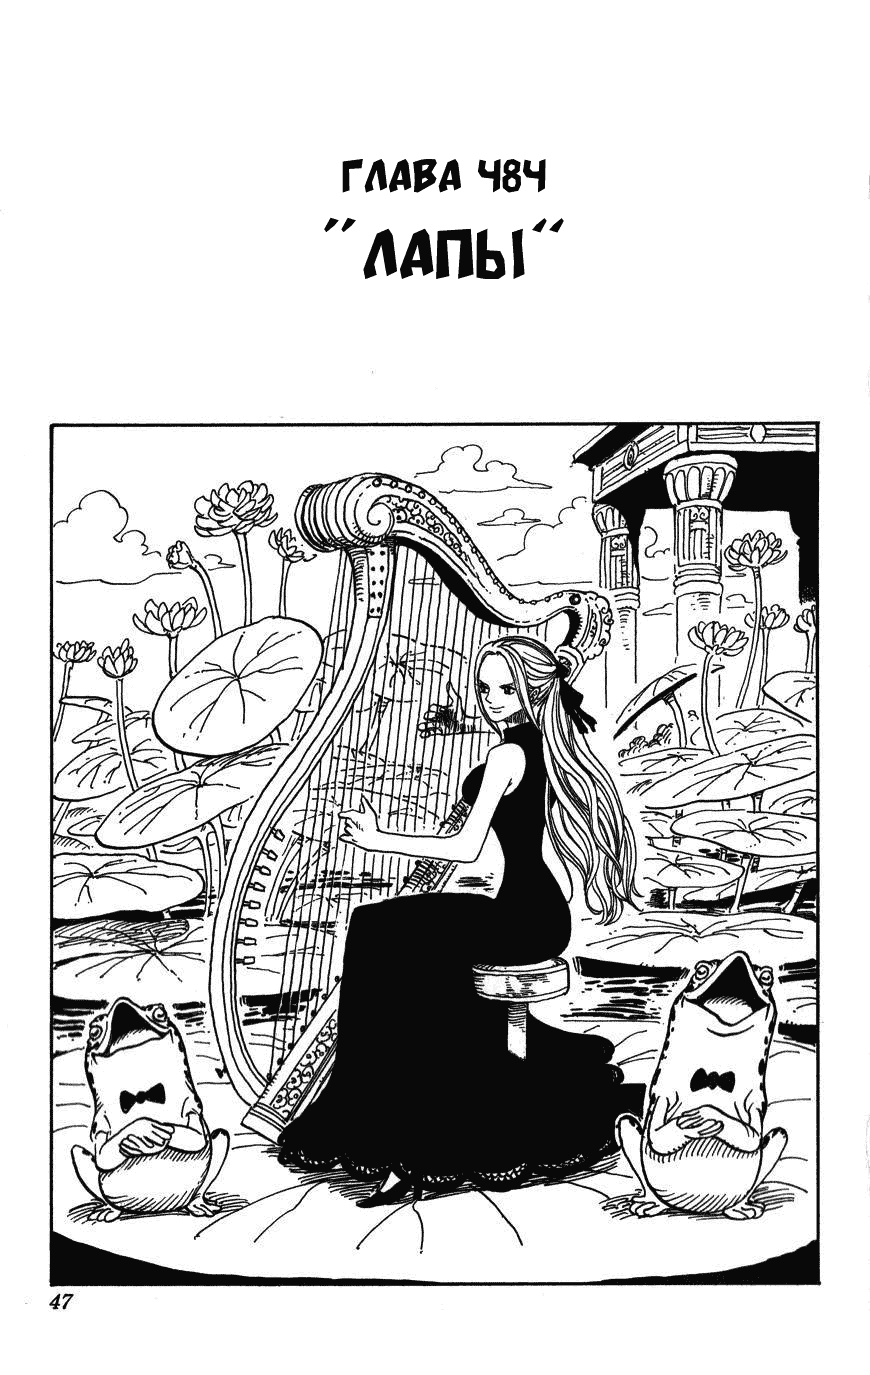 Манга One Piece / Ван Пис Манга One Piece Глава # 484 - Лапы, страница 1